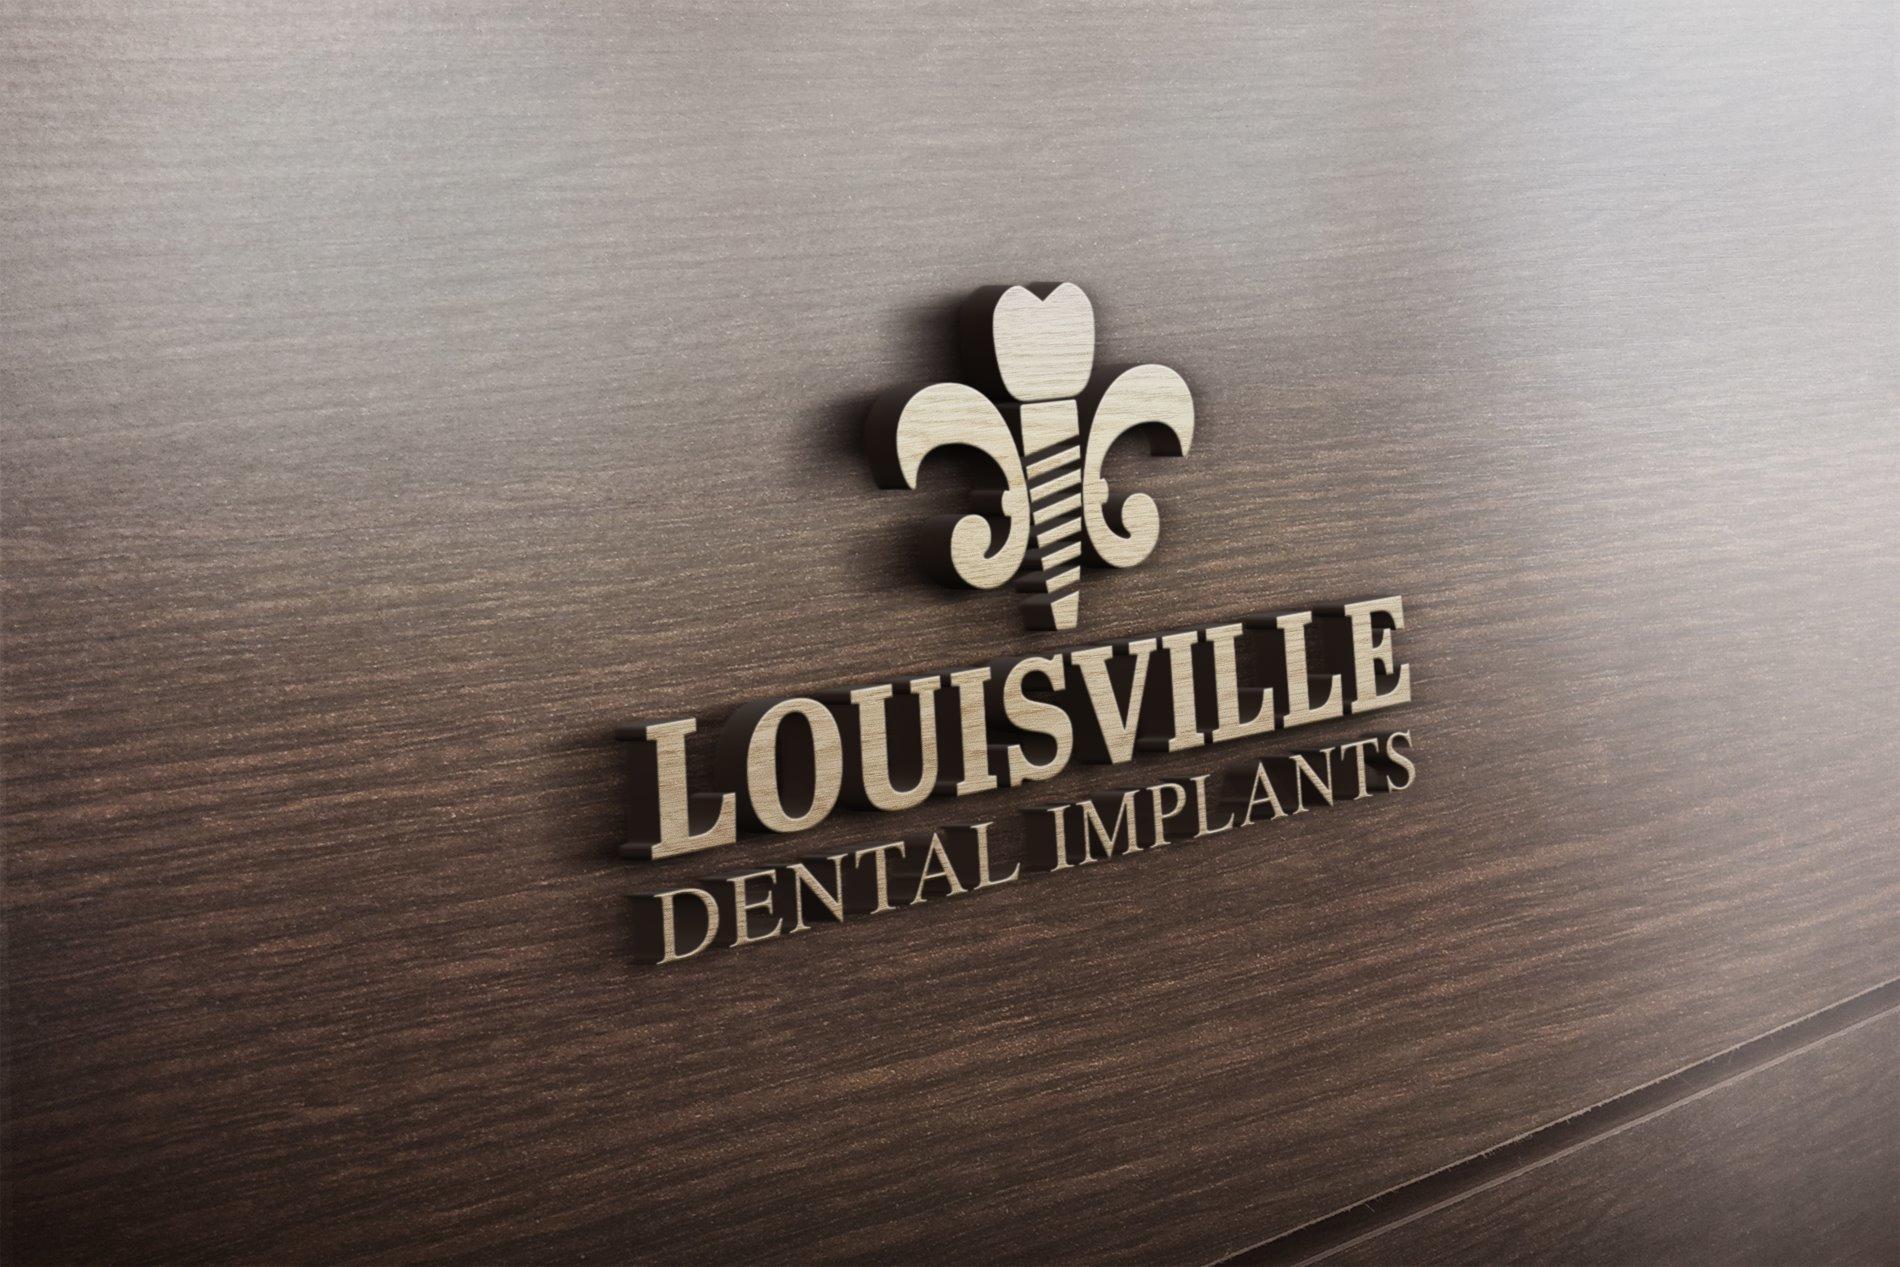 Louisville Dental Implants image 7